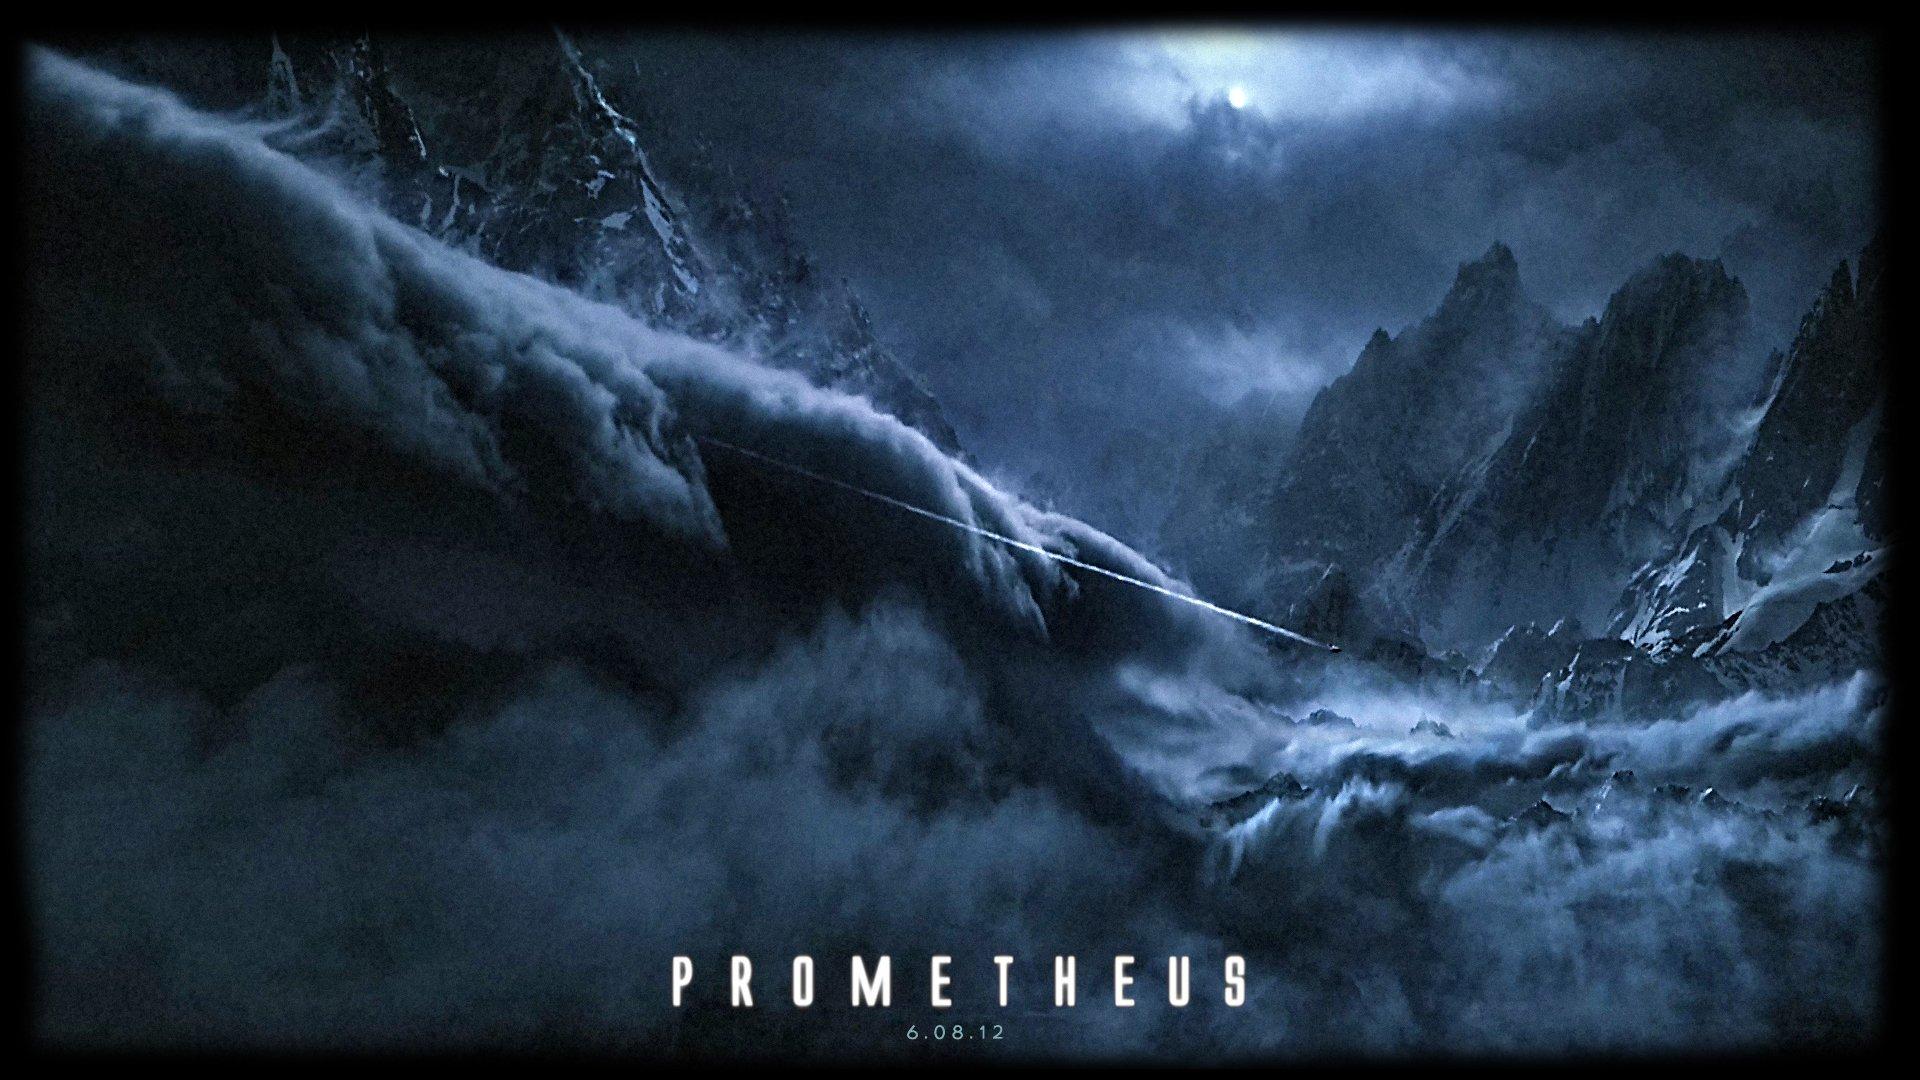 Prometheus Fondo De Pantalla Hd Fondo De Escritorio